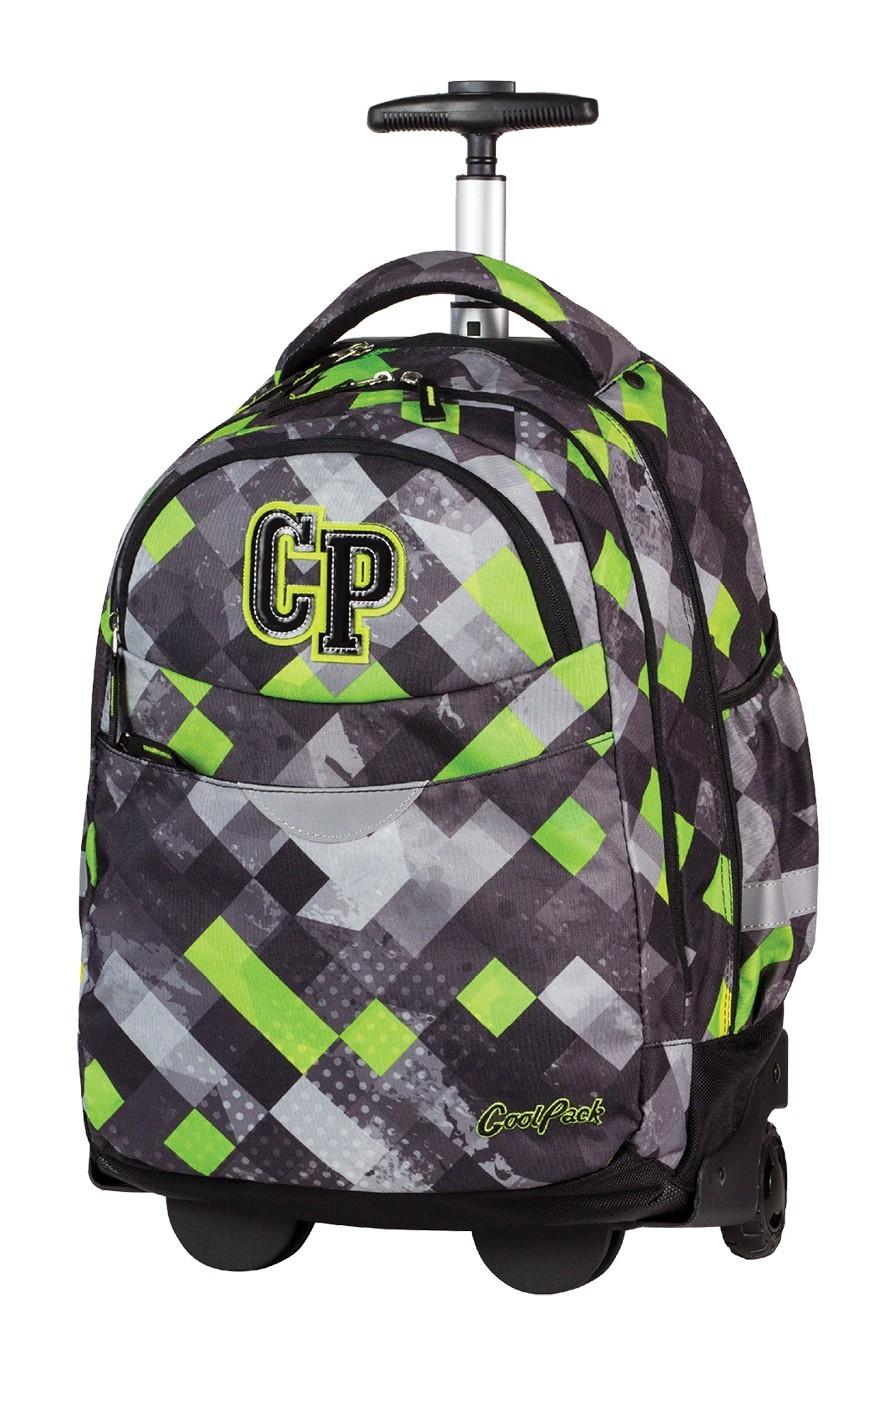 090135018d841 Plecak na kółkach CoolPack CP szary w kratkę dla chłopca RAPID GRUNGE GREY  457